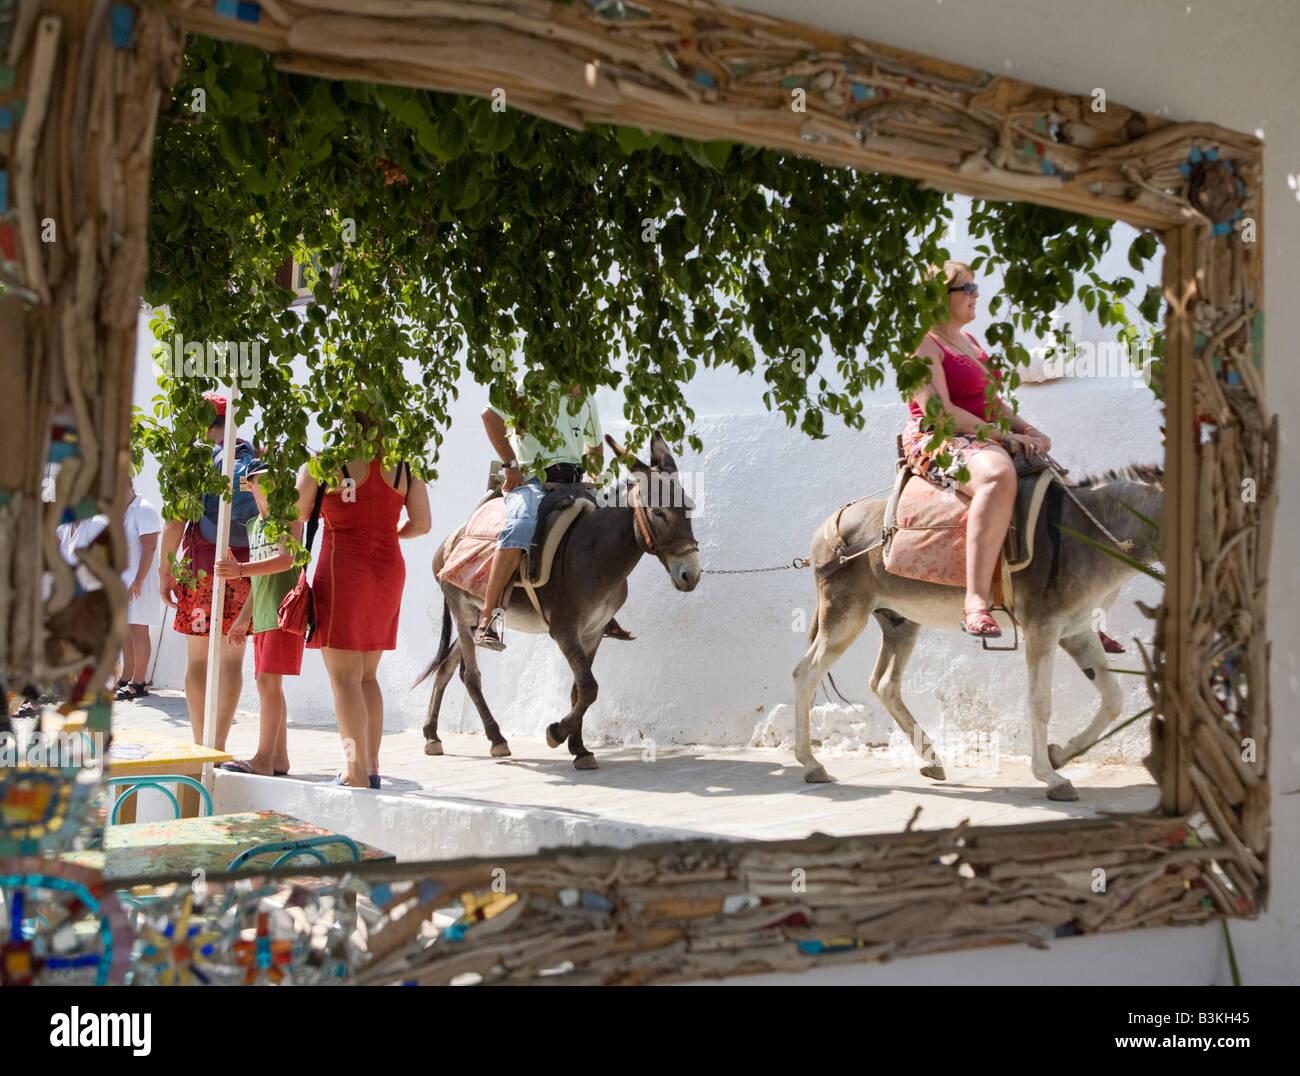 Mirror reflection of tourists riding donkeys, Lindos, Rhodes, Greece Stock Photo